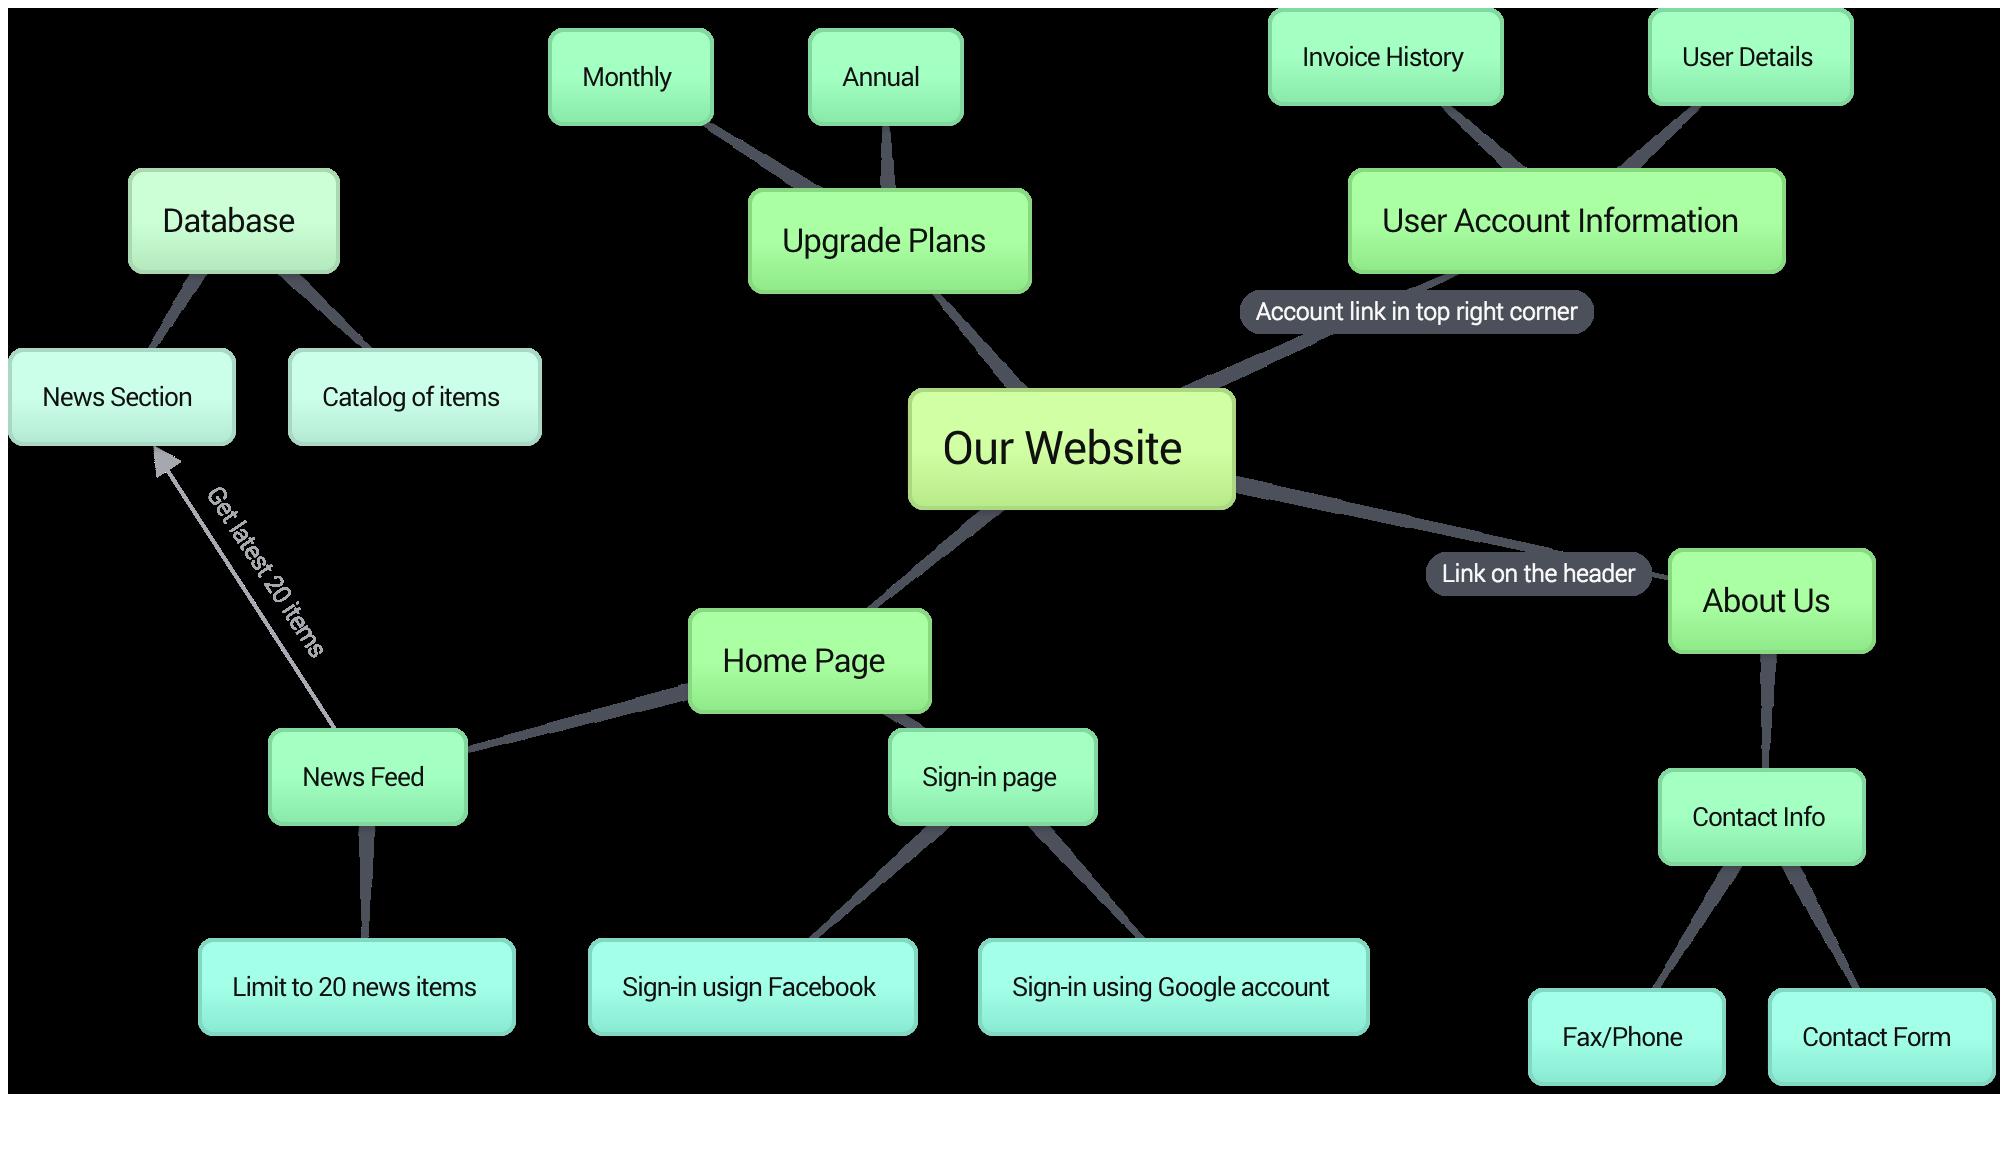 bubblus per crear mapes conceptuals online eina contenidora mind map onlinemind mapping toolsmind - Mind Map Online Tool